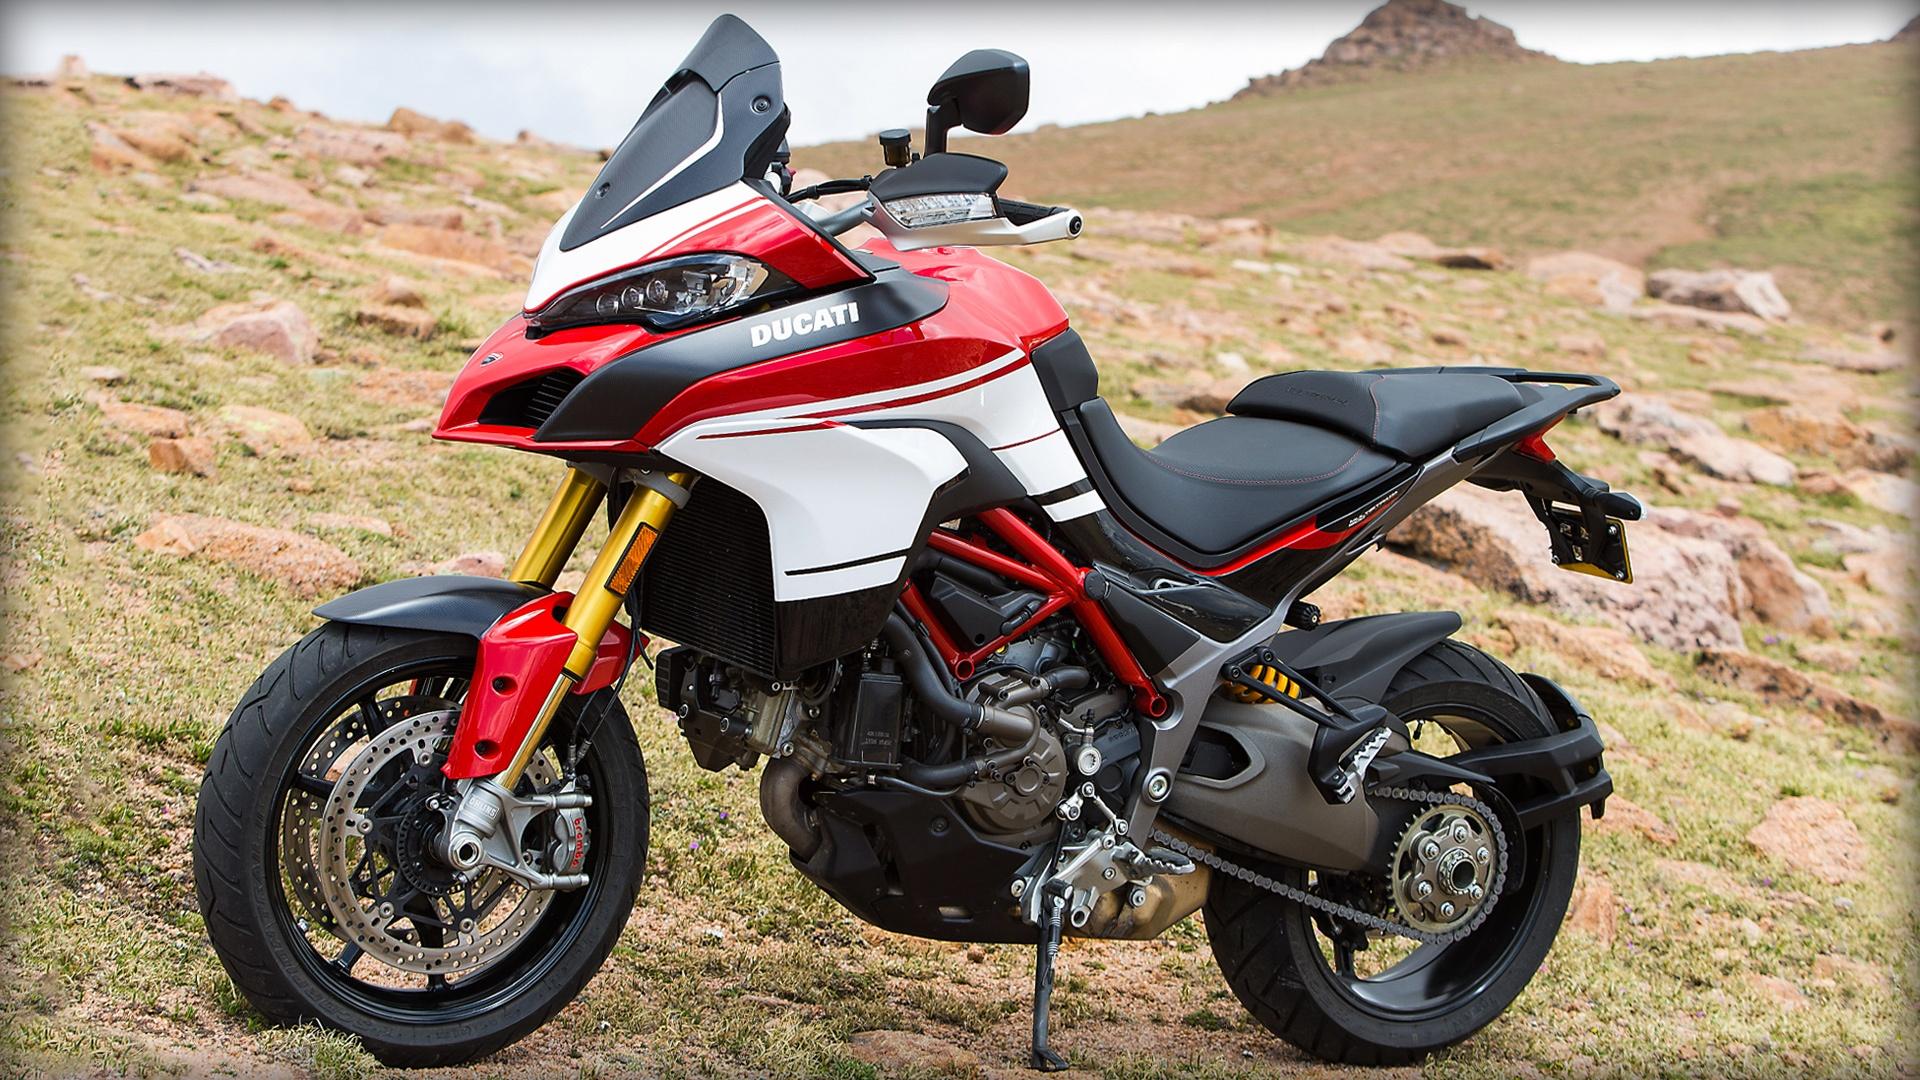 Ducati Multistrada Pikes Peak For Sale